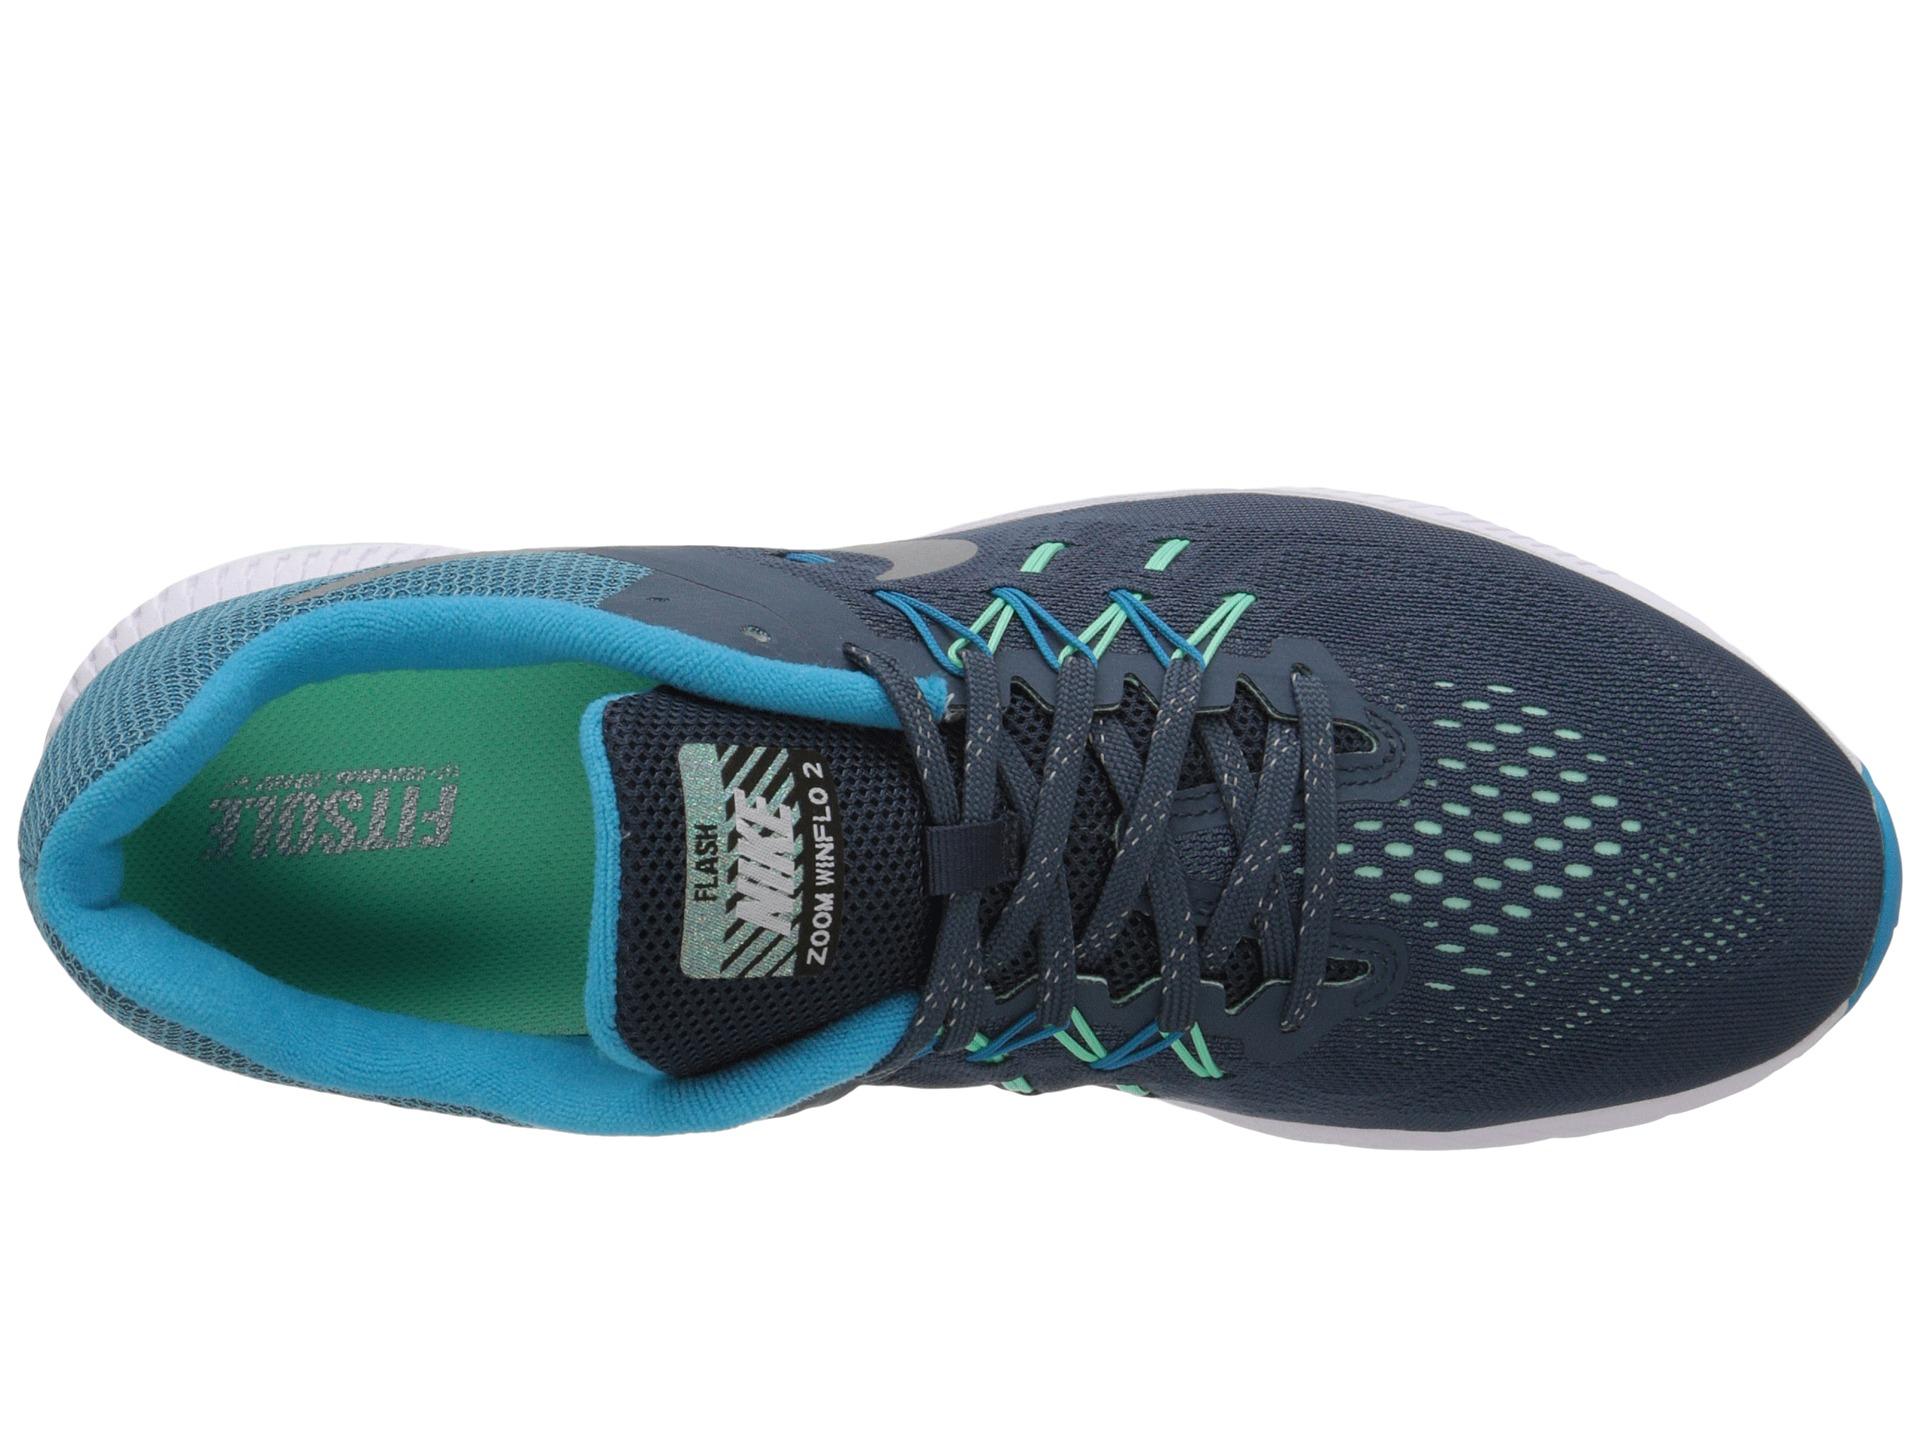 Lyst - Nike Zoom Winflo 2 Flash in Blue for Men da11d9419f79